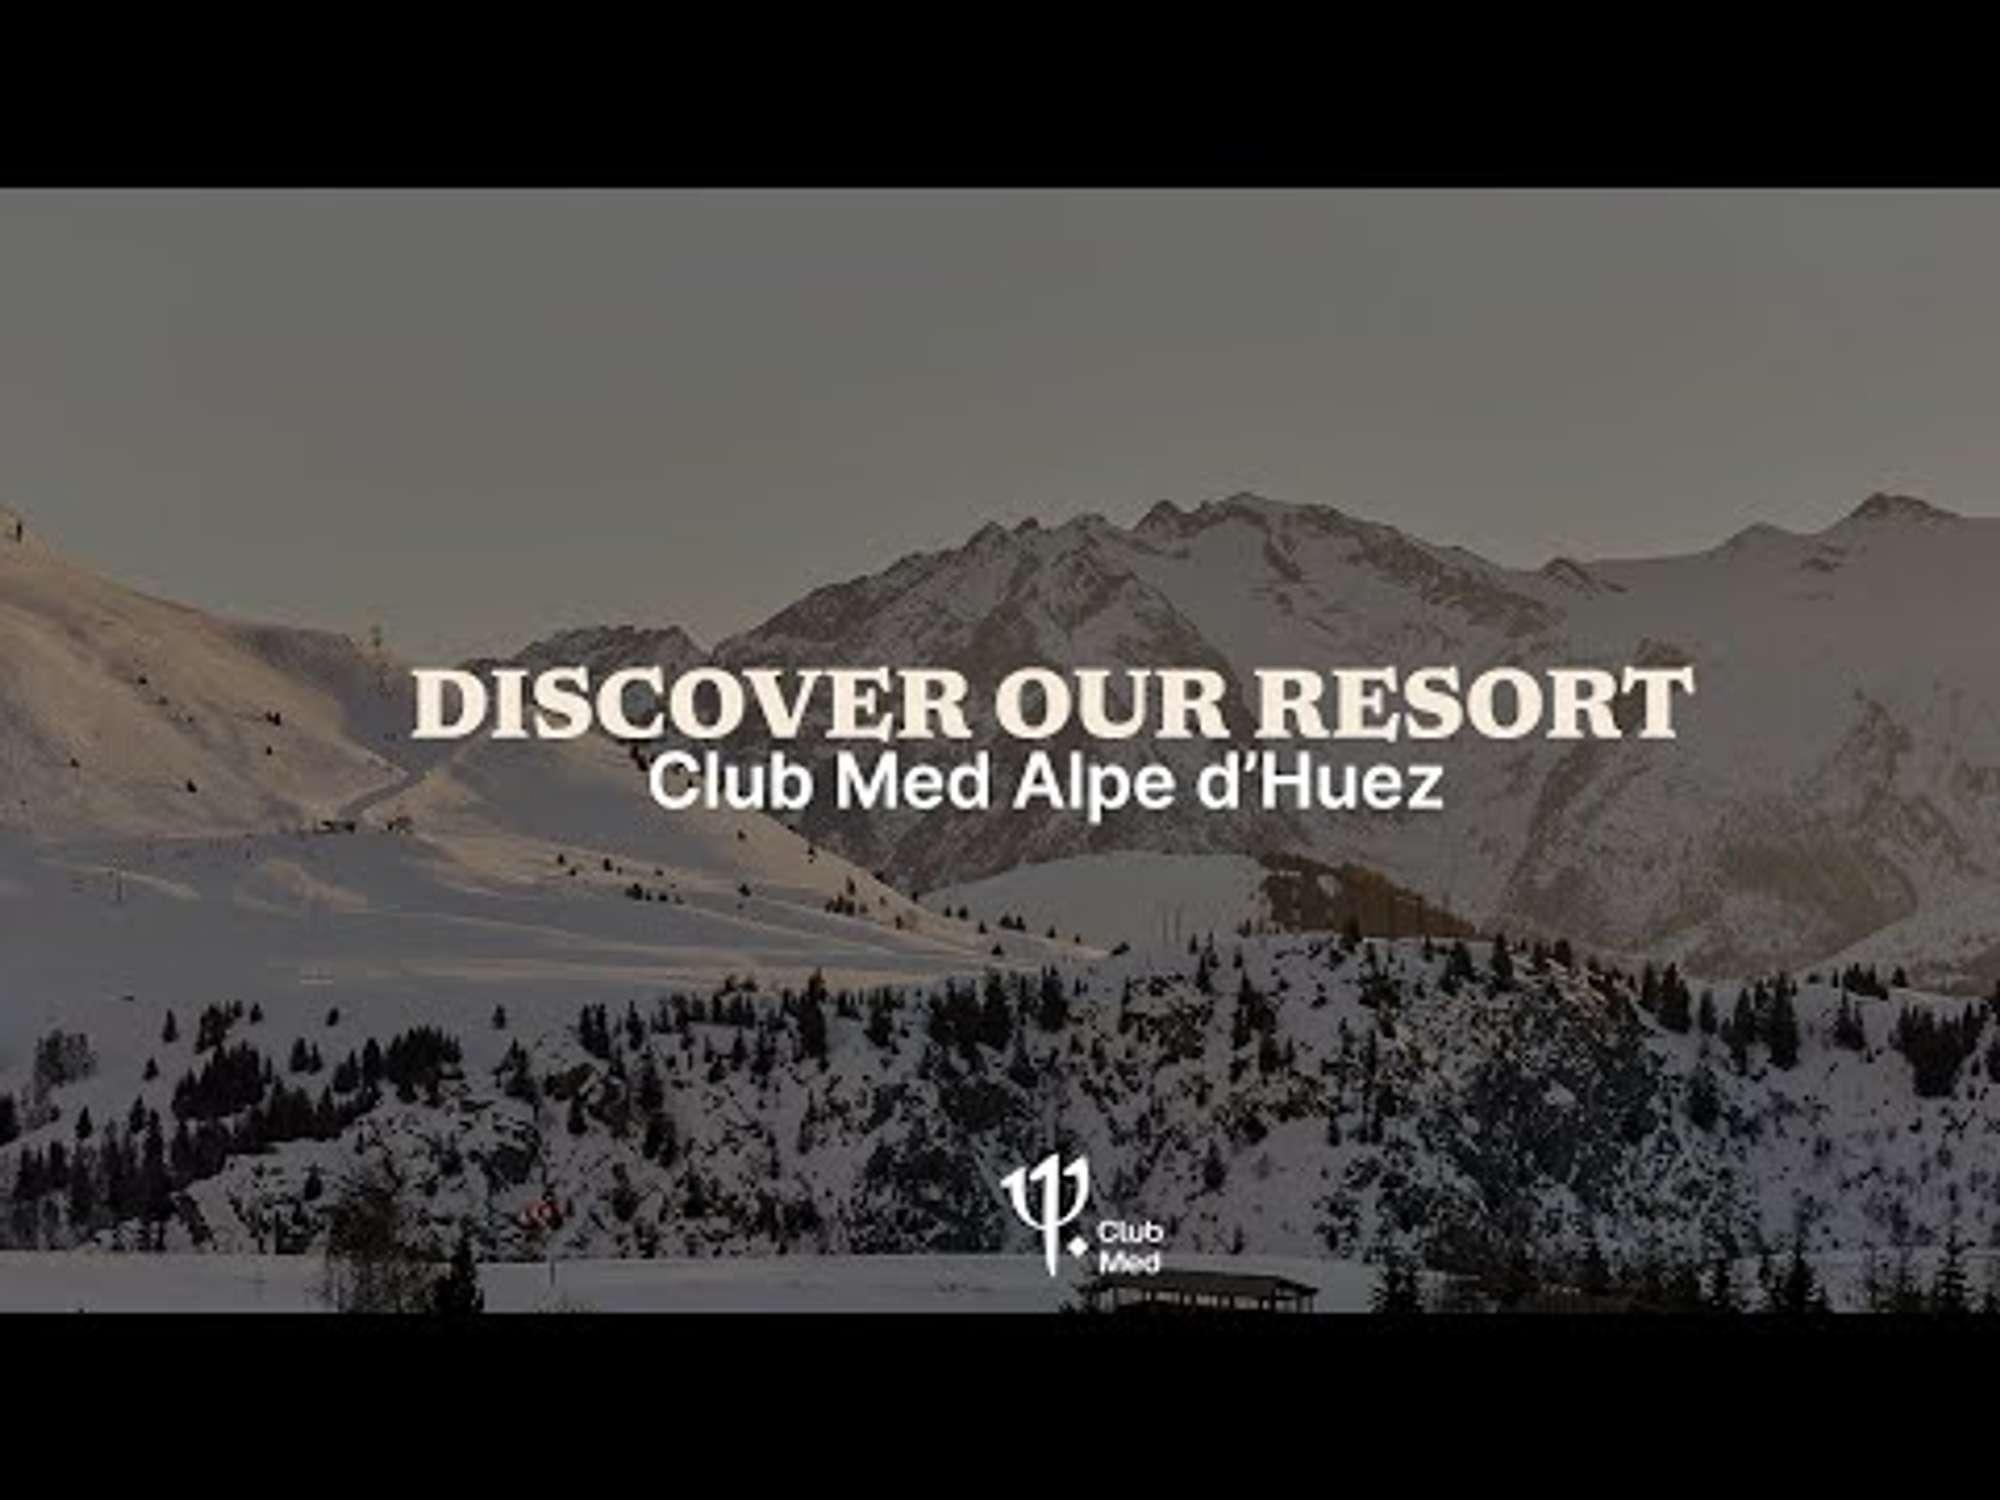 Open Alpe d'Huez וידיאו slideshow gallery at 1